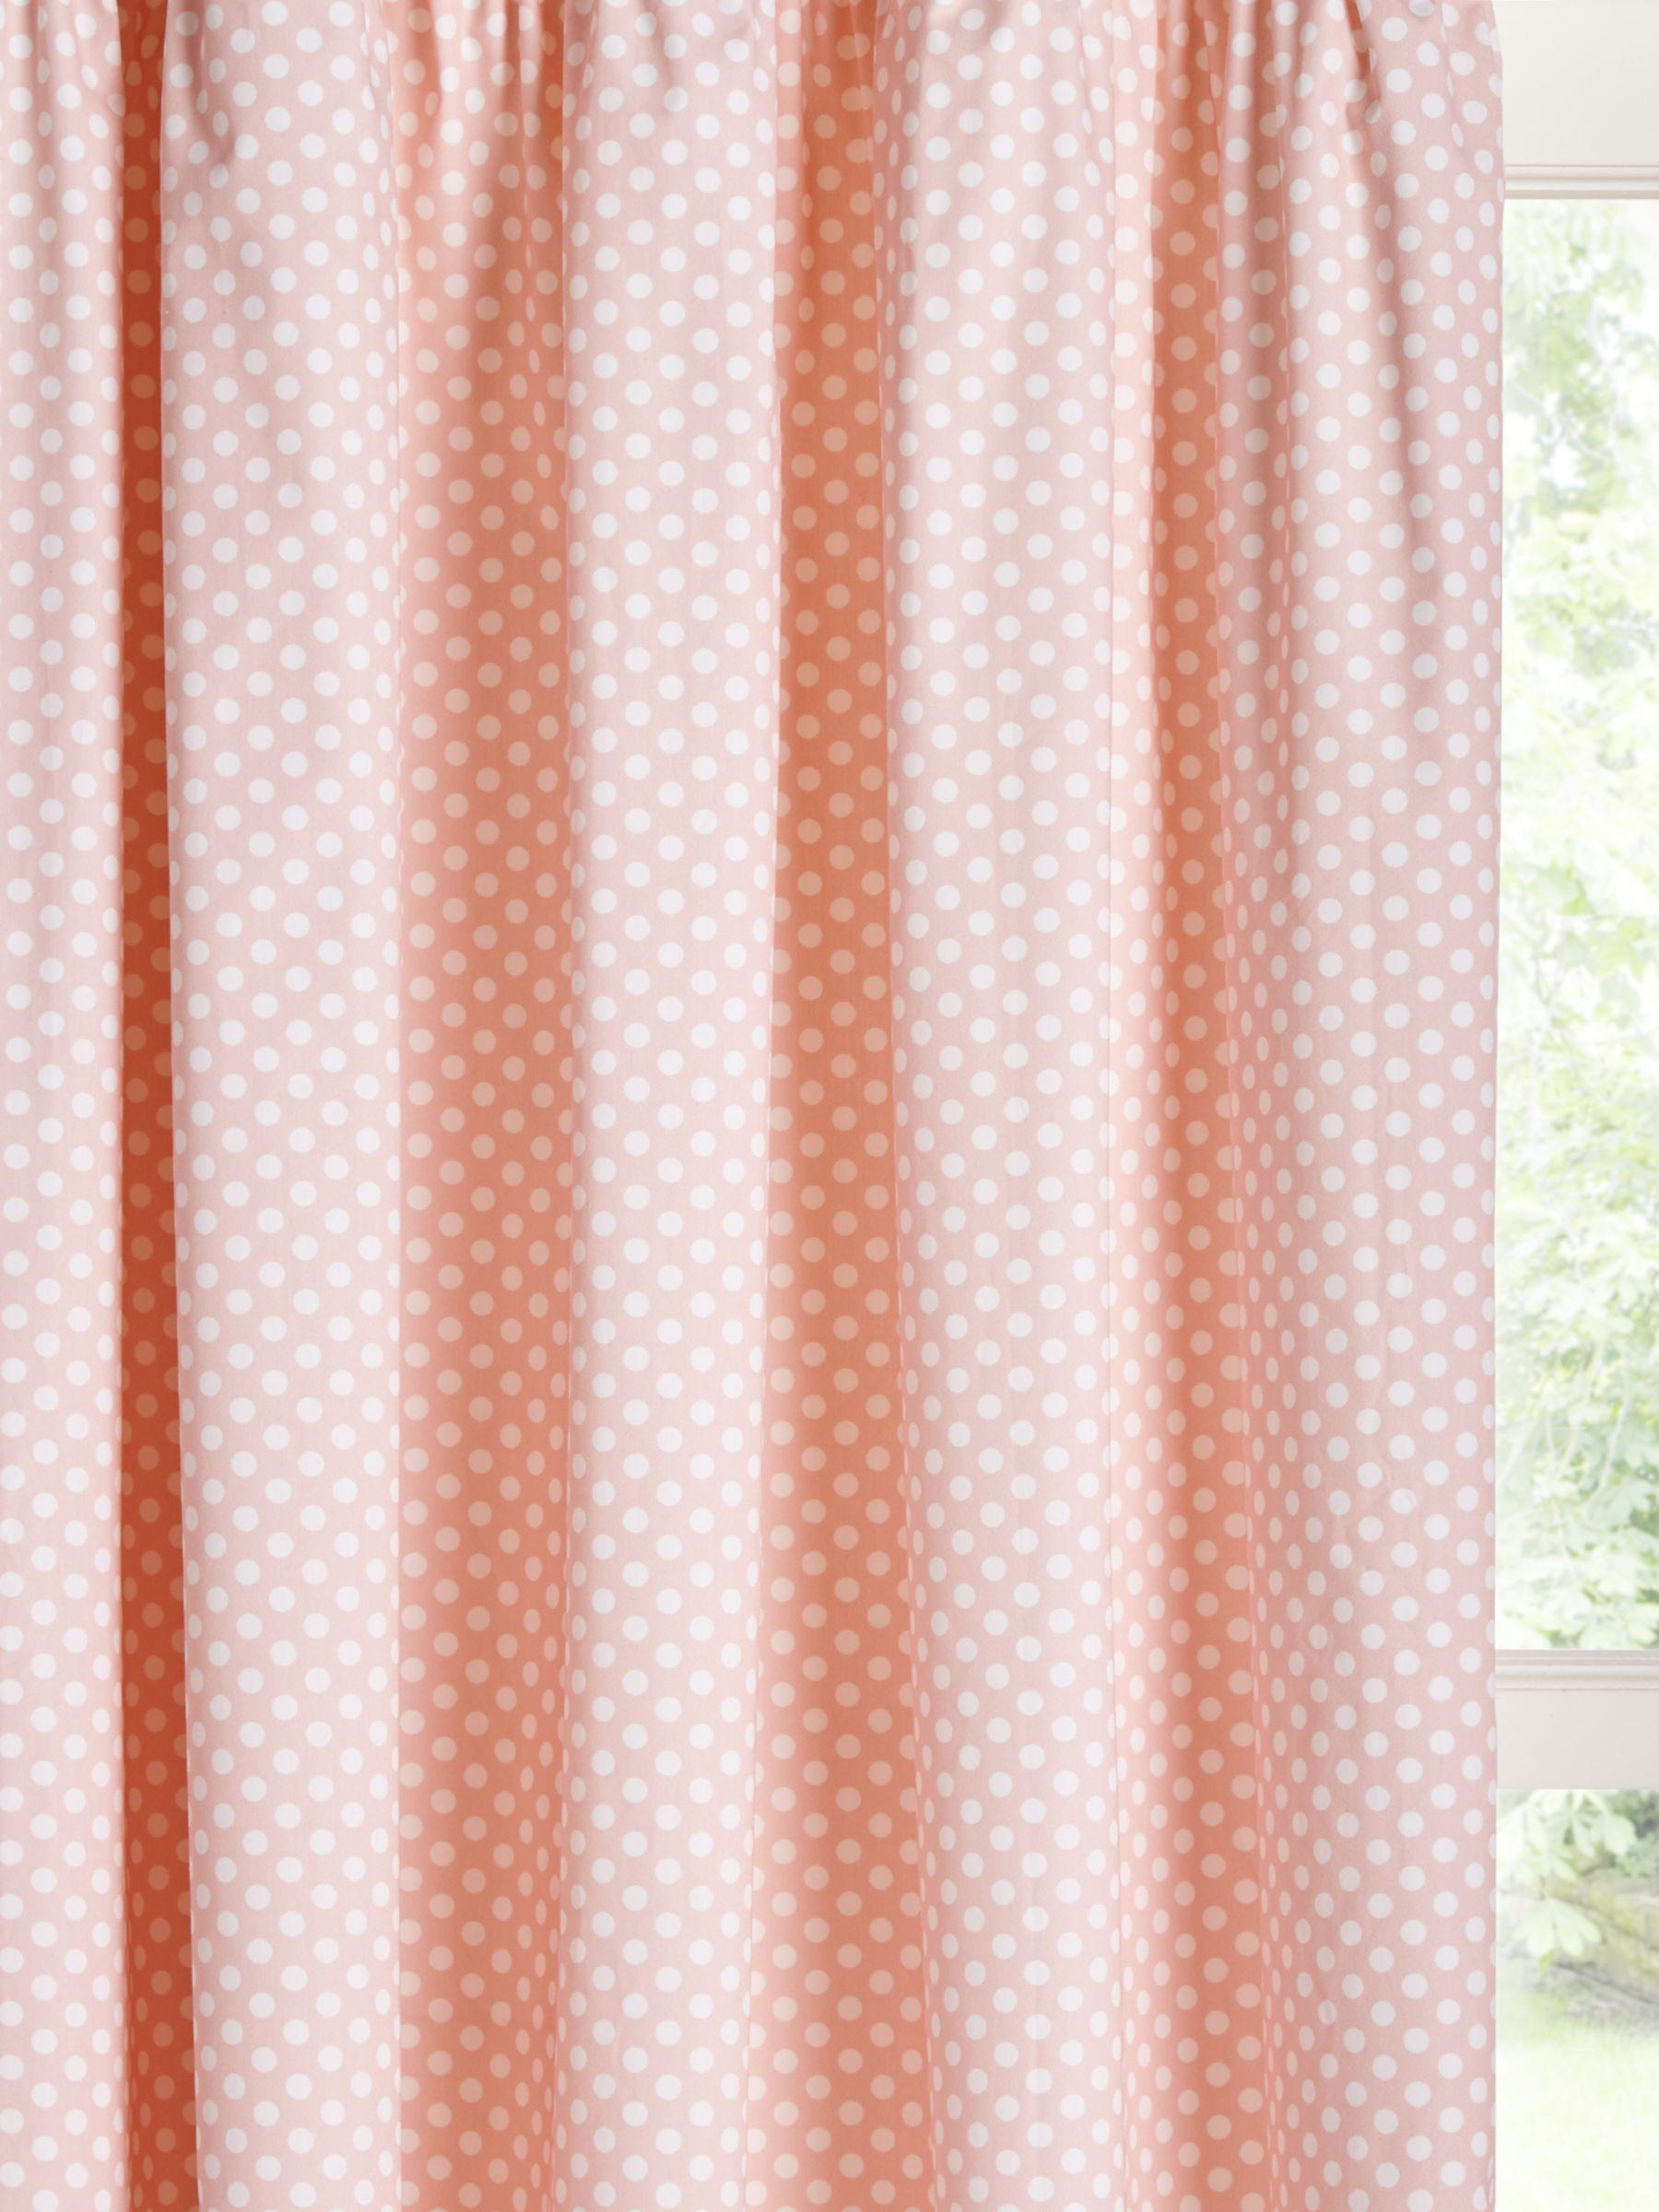 little home at John Lewis little home at John Lewis Polka Dot Print Pencil Pleat Children's Curtains, Pink